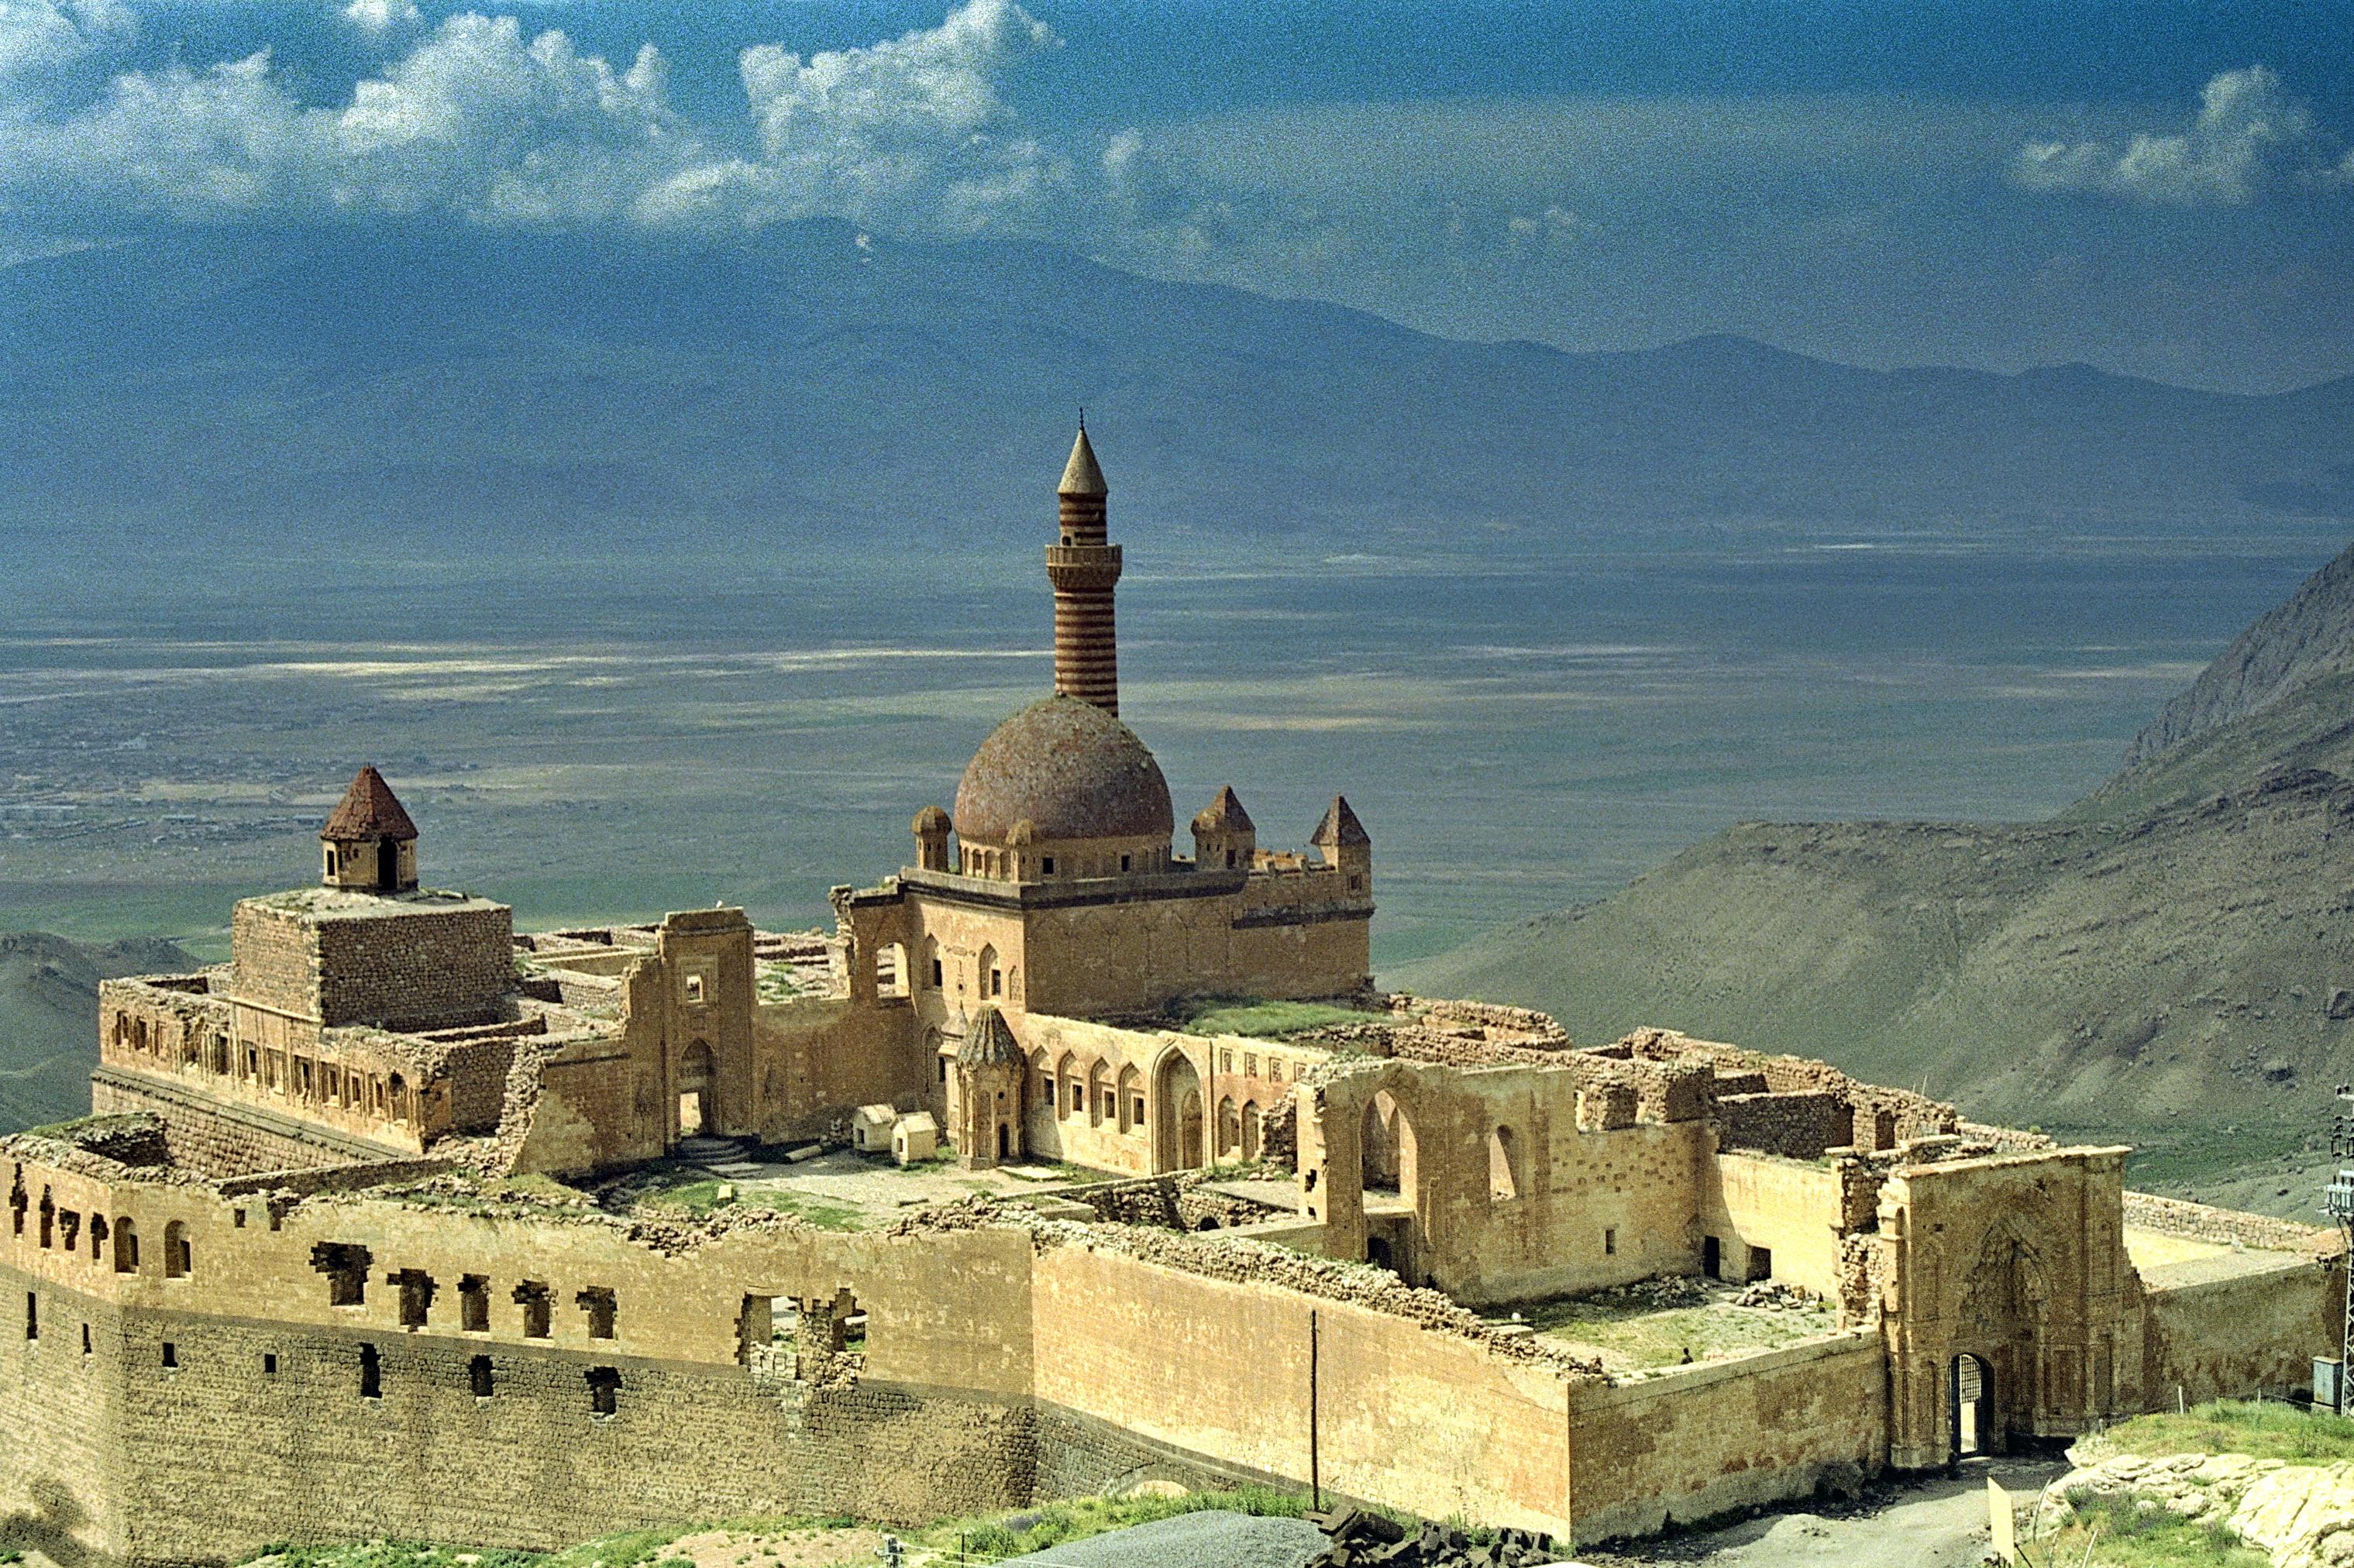 File:Ishak Pasha Palace 001.jpg - Wikimedia Commons